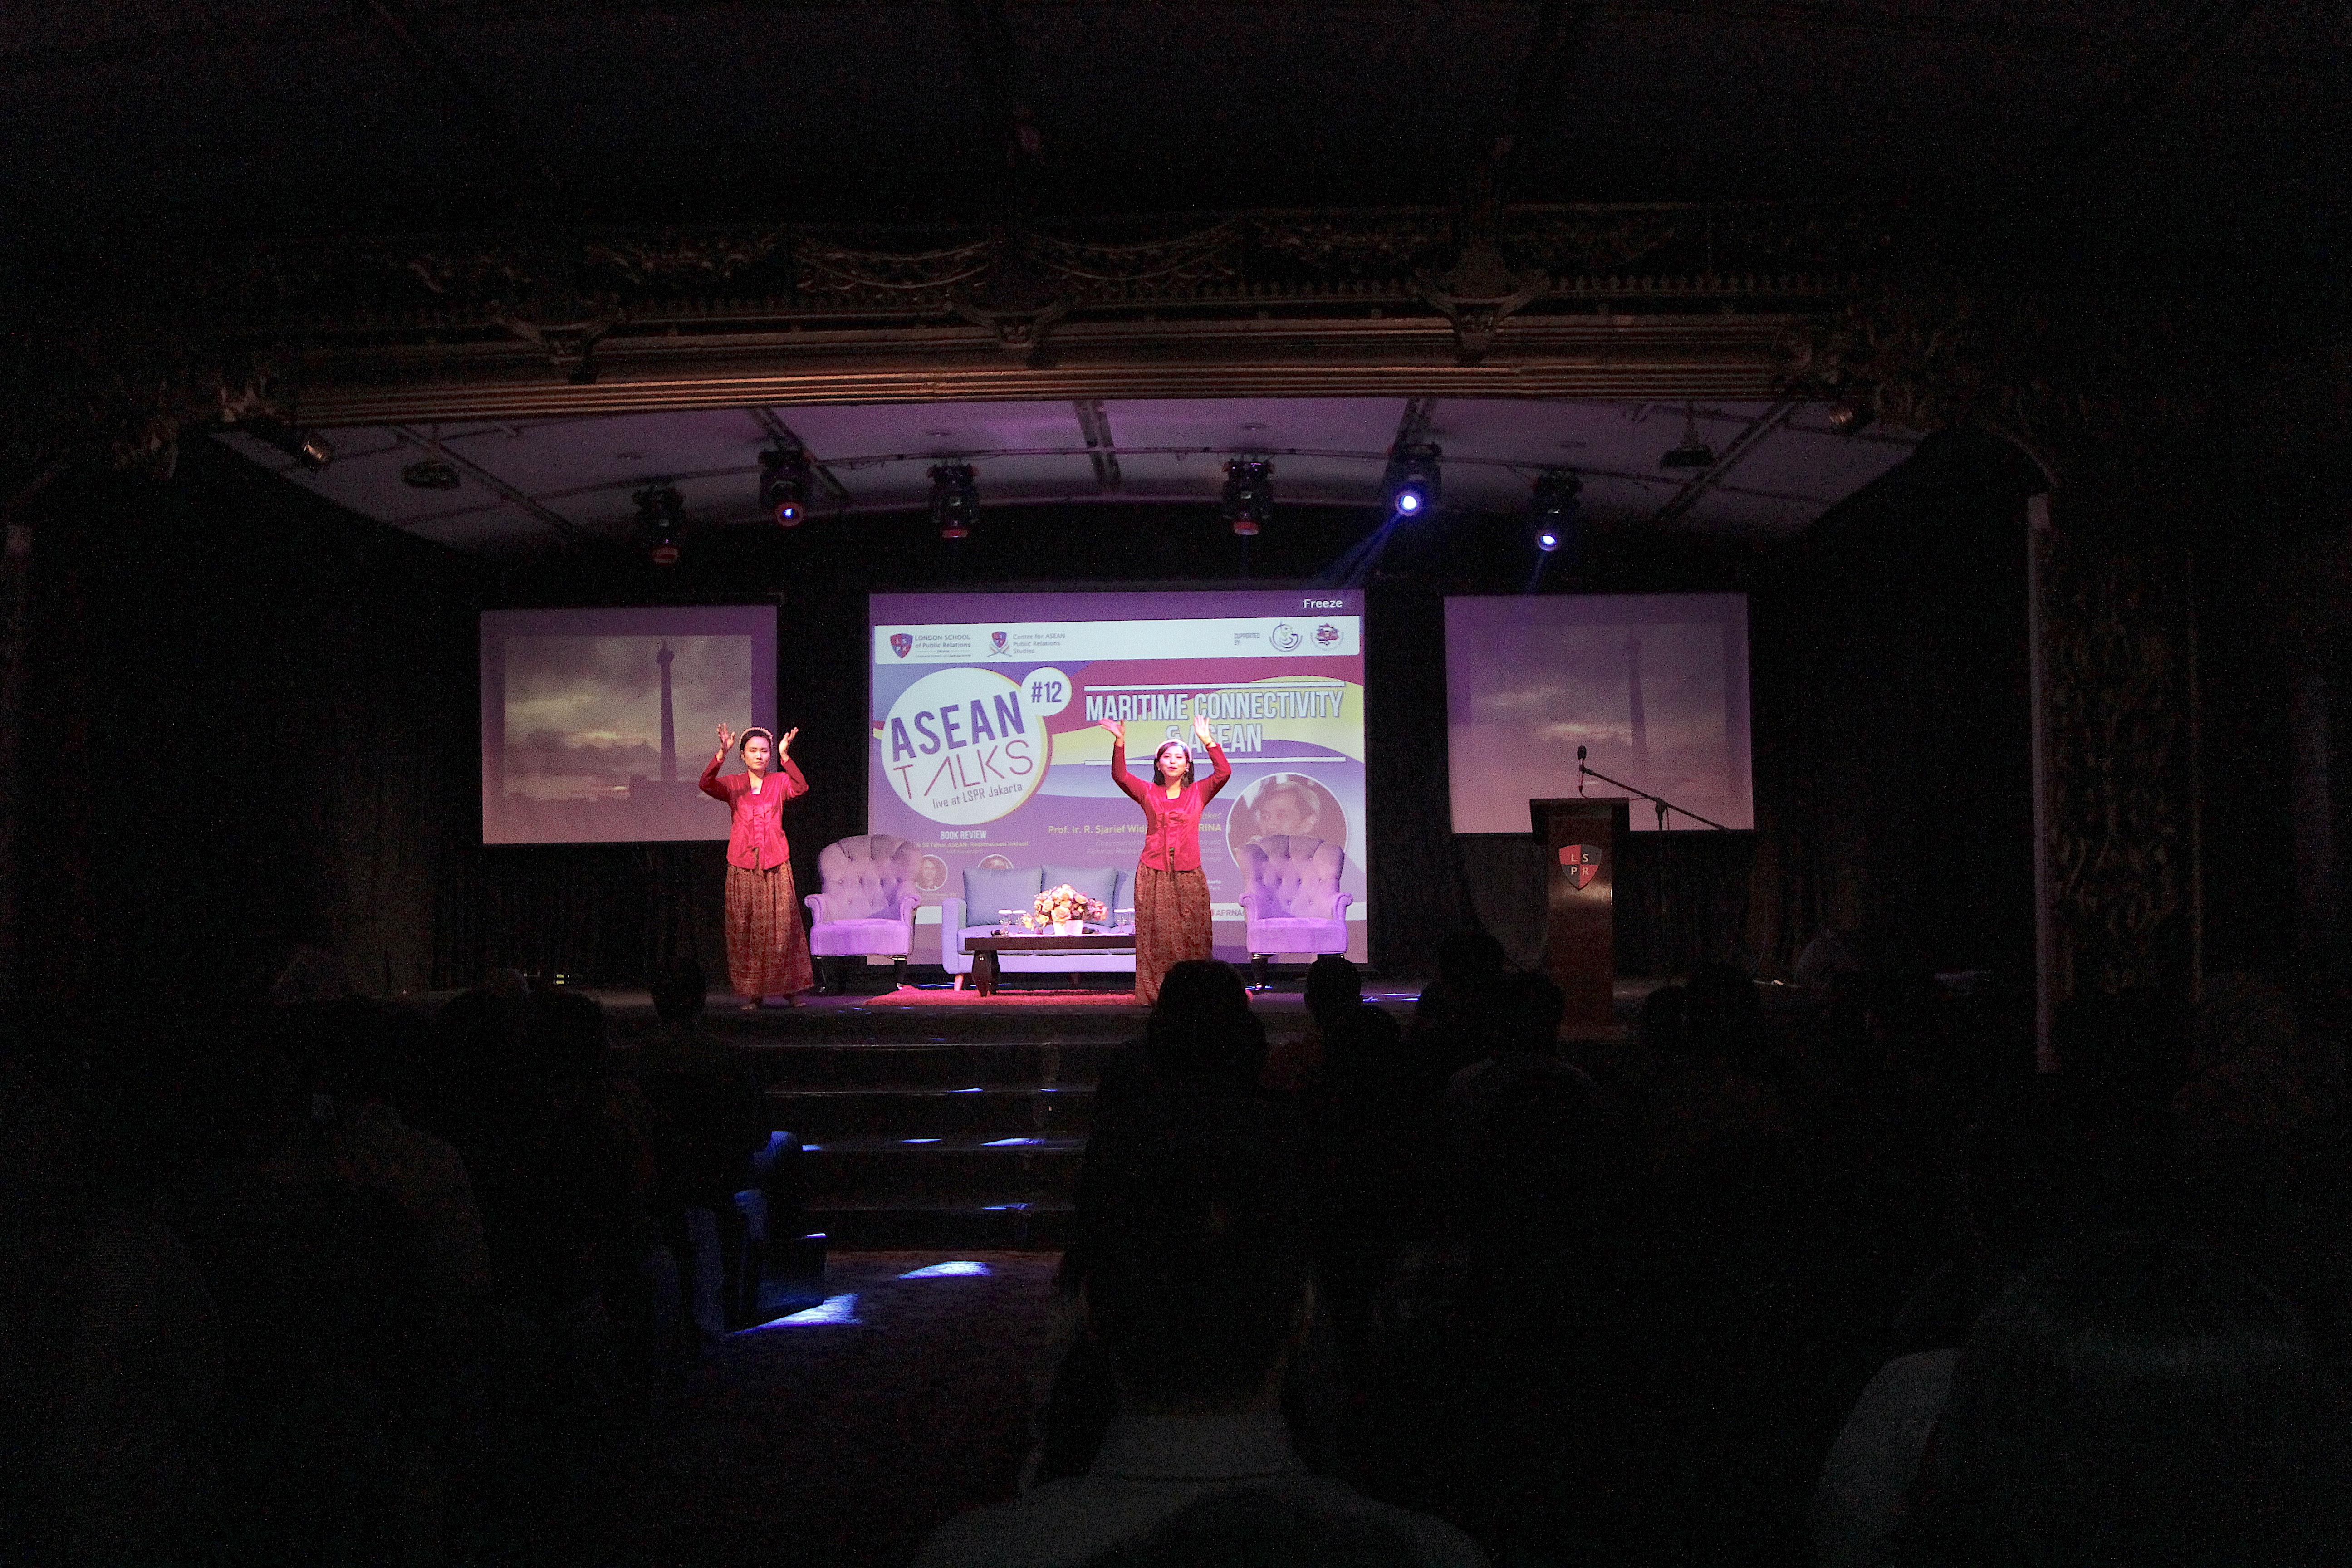 Kicir-Kicir Performance